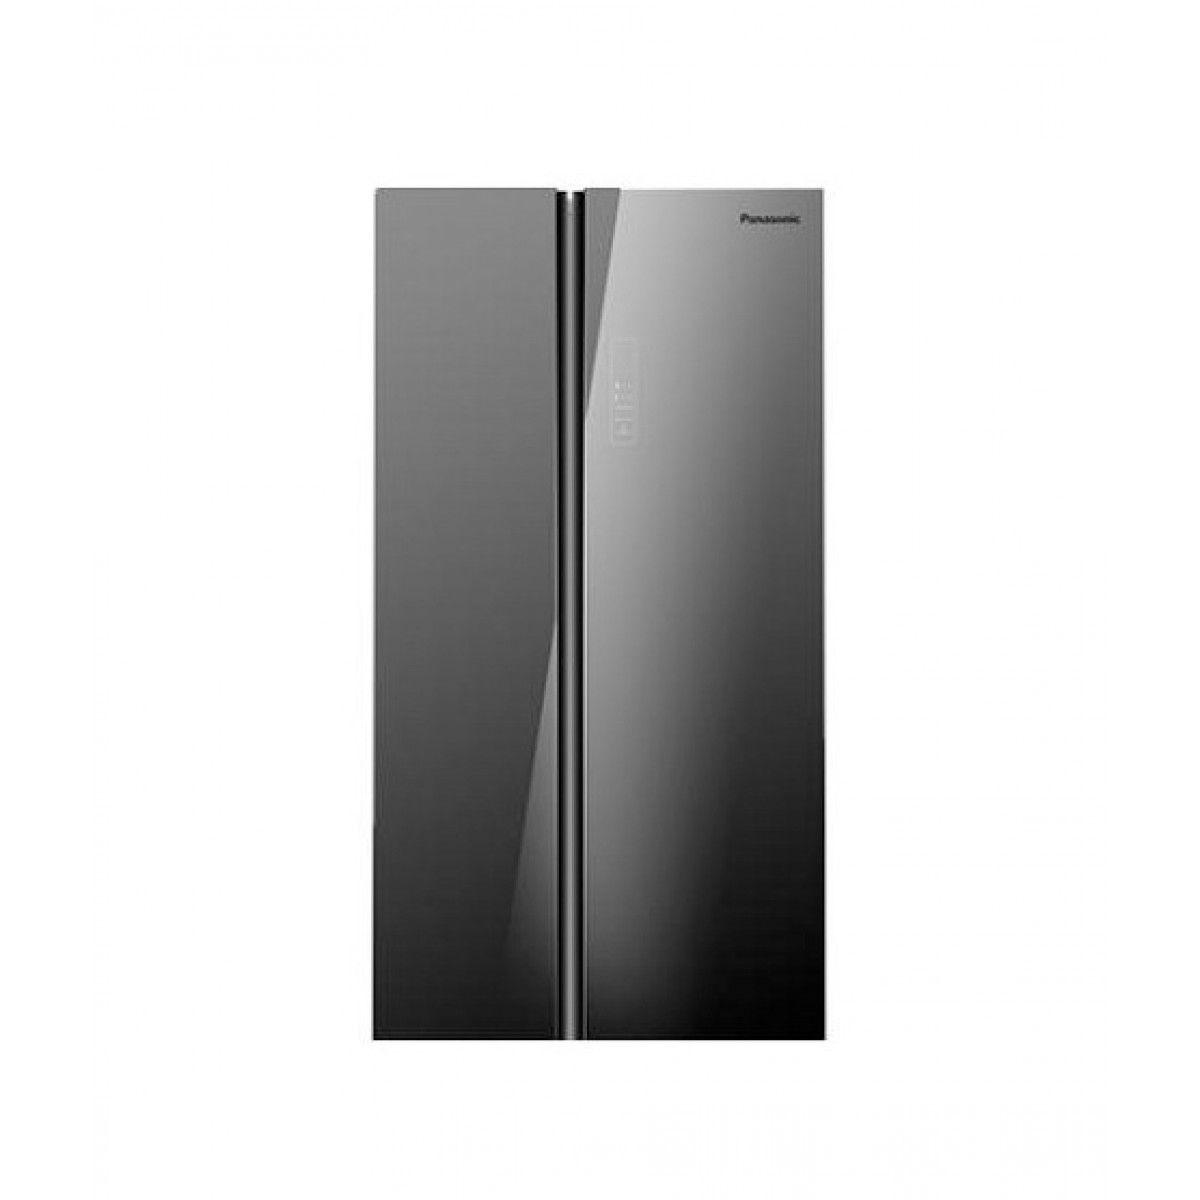 Panasonic NR-BS701 Side-By-Side 700L Refrigerator